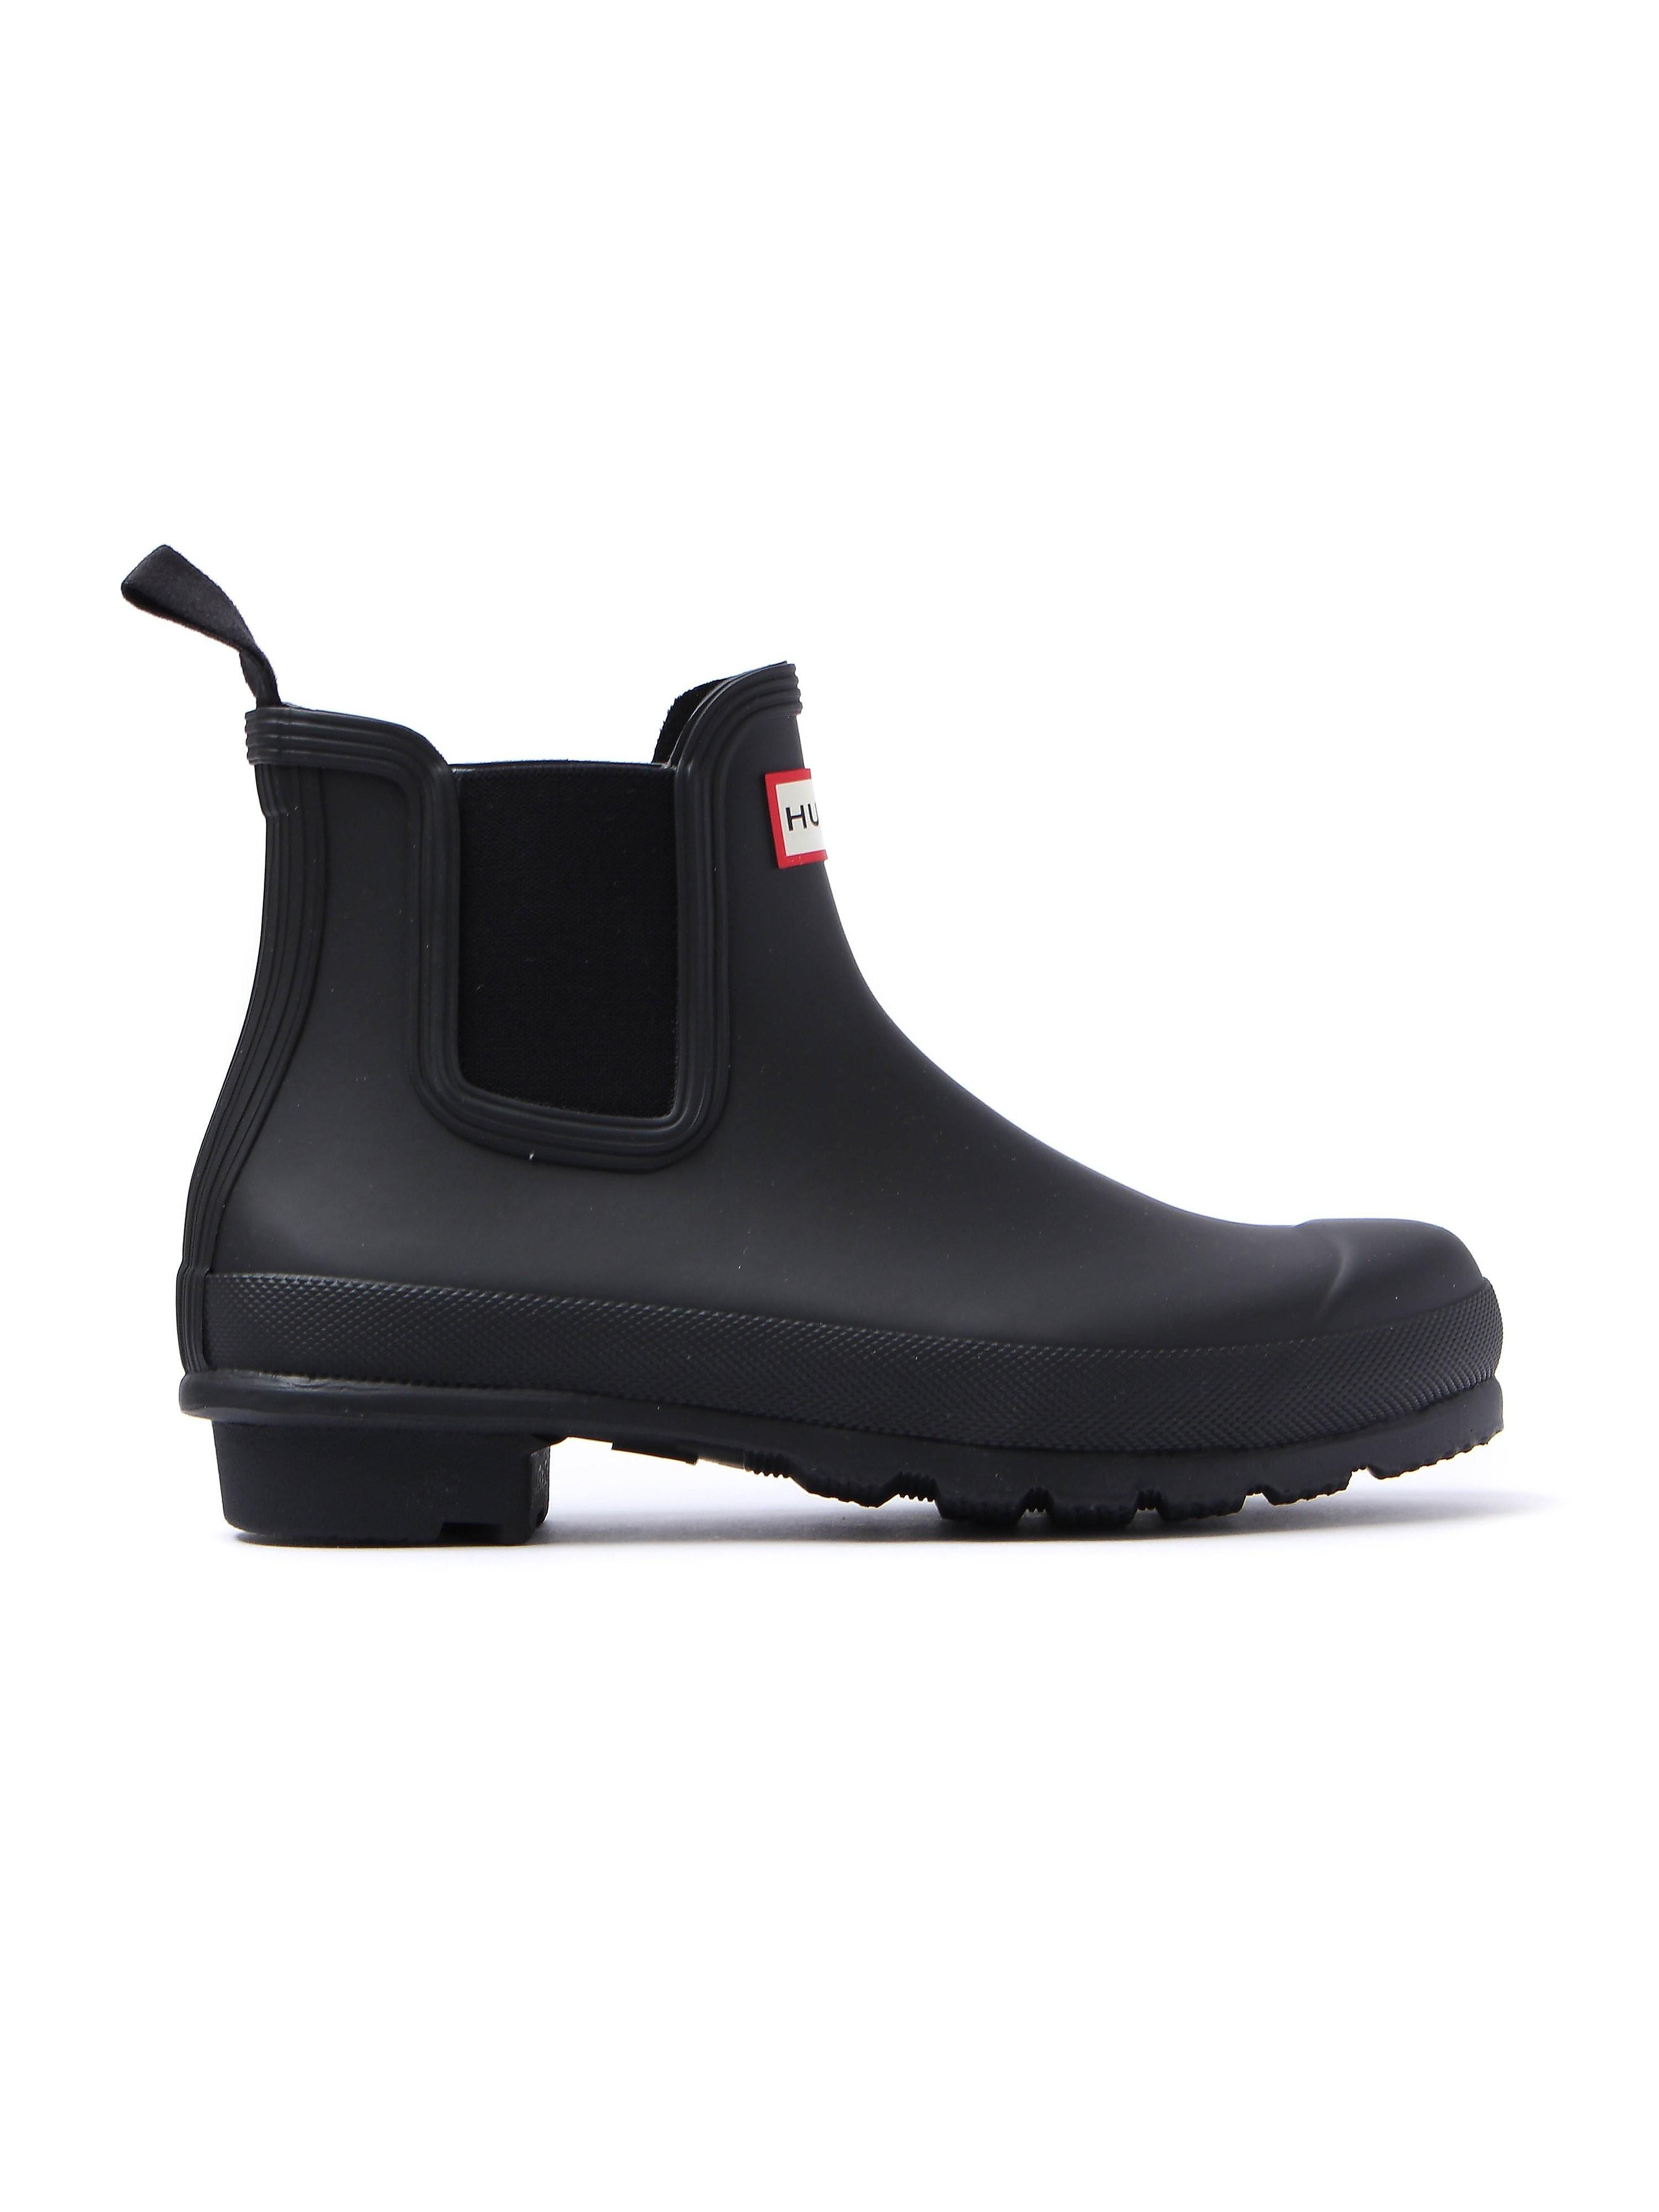 Hunter Wellies Women's Original Chelsea Boots - Black